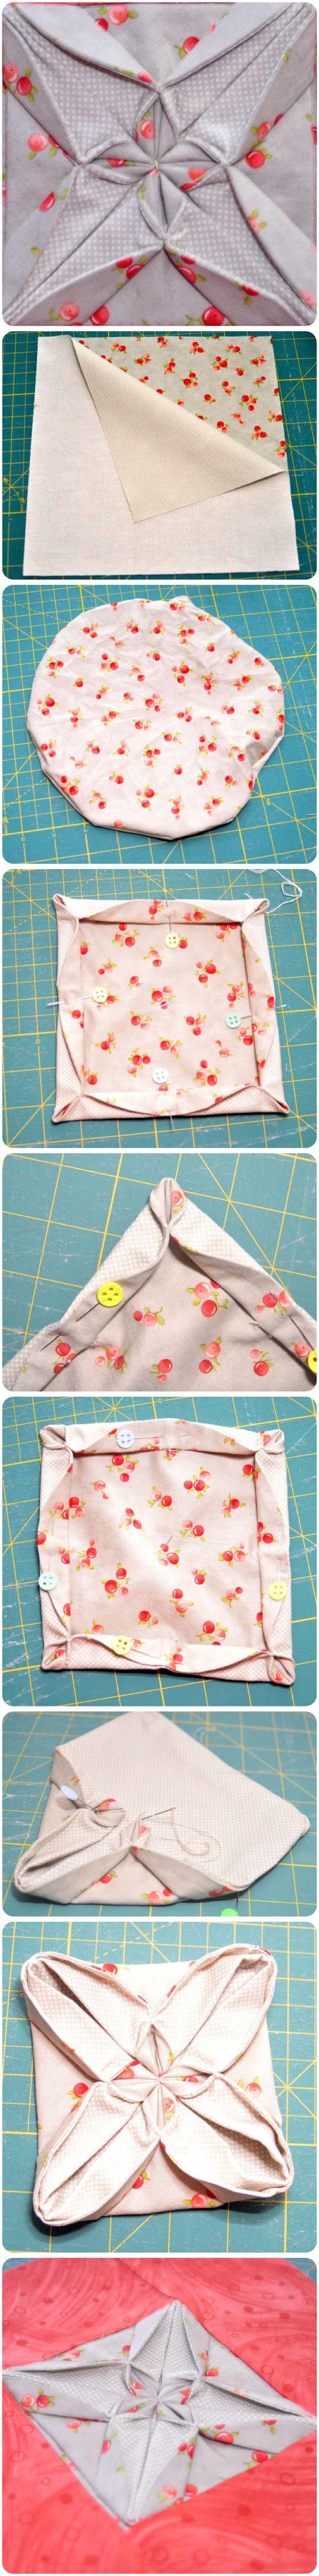 Fabric origami tutorial - quilt block. Links to 25 different blocks using folding/origami.